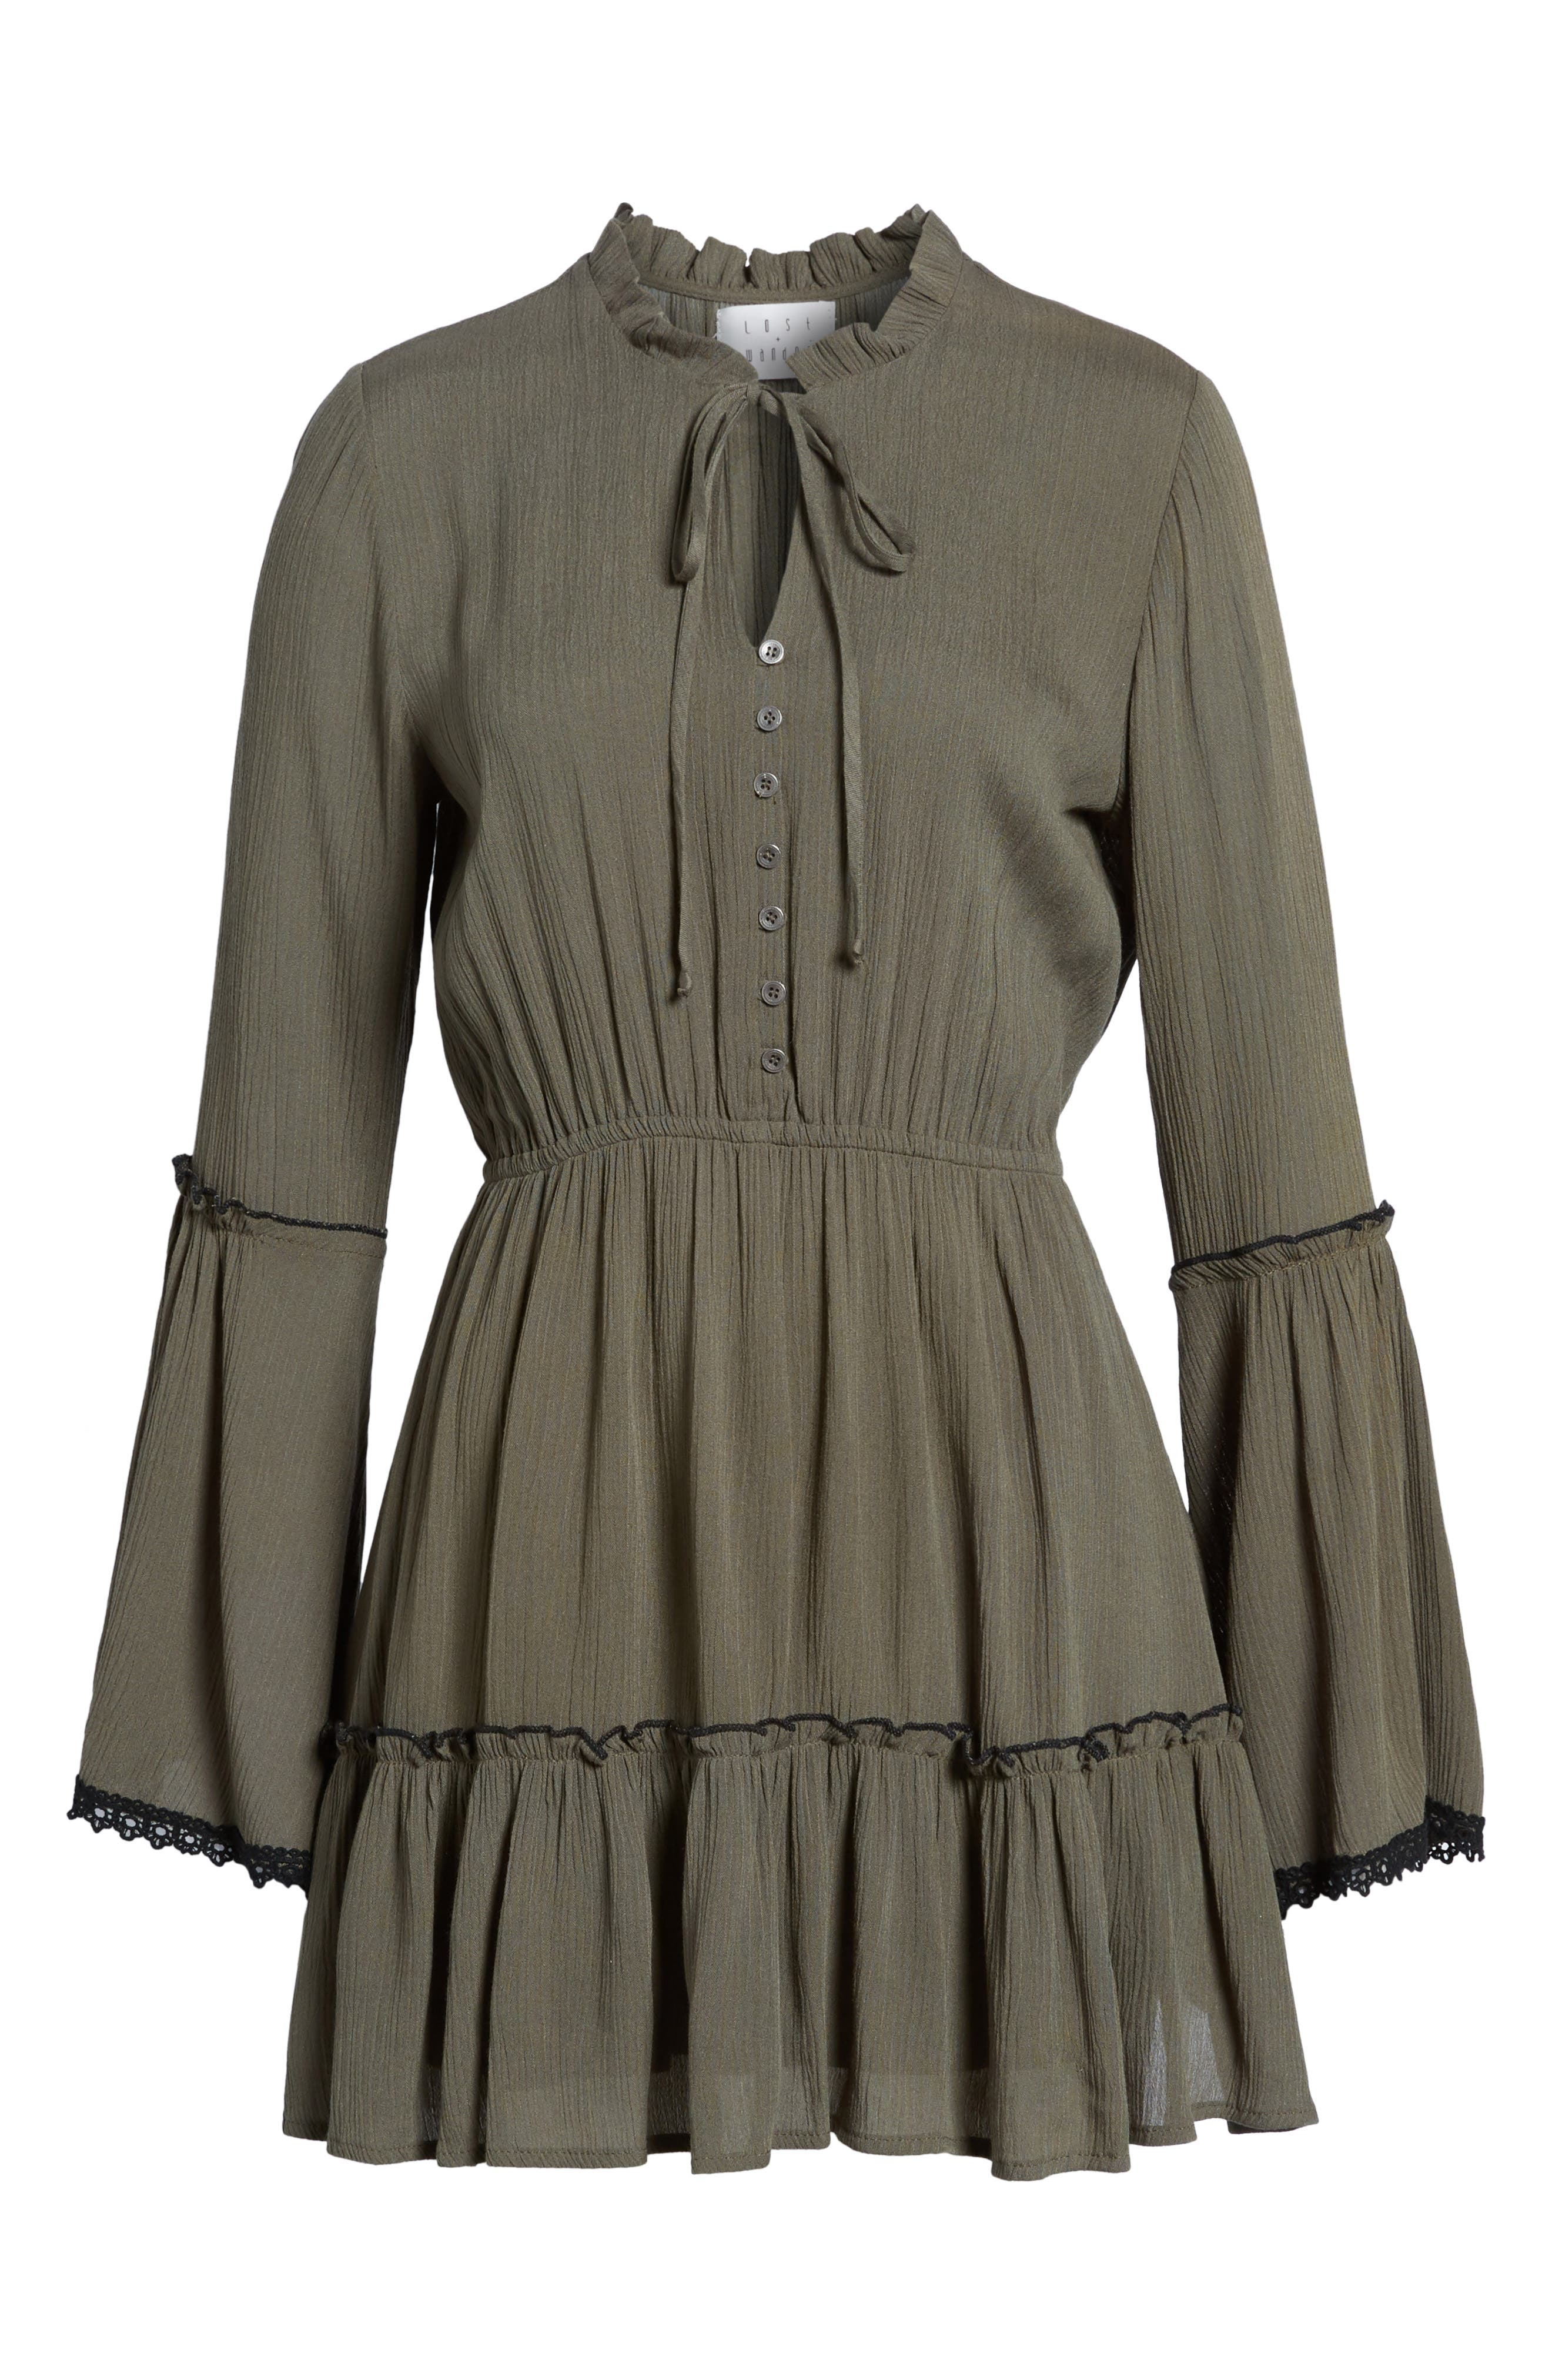 Olivia Bell Sleeve Dress,                             Alternate thumbnail 6, color,                             310